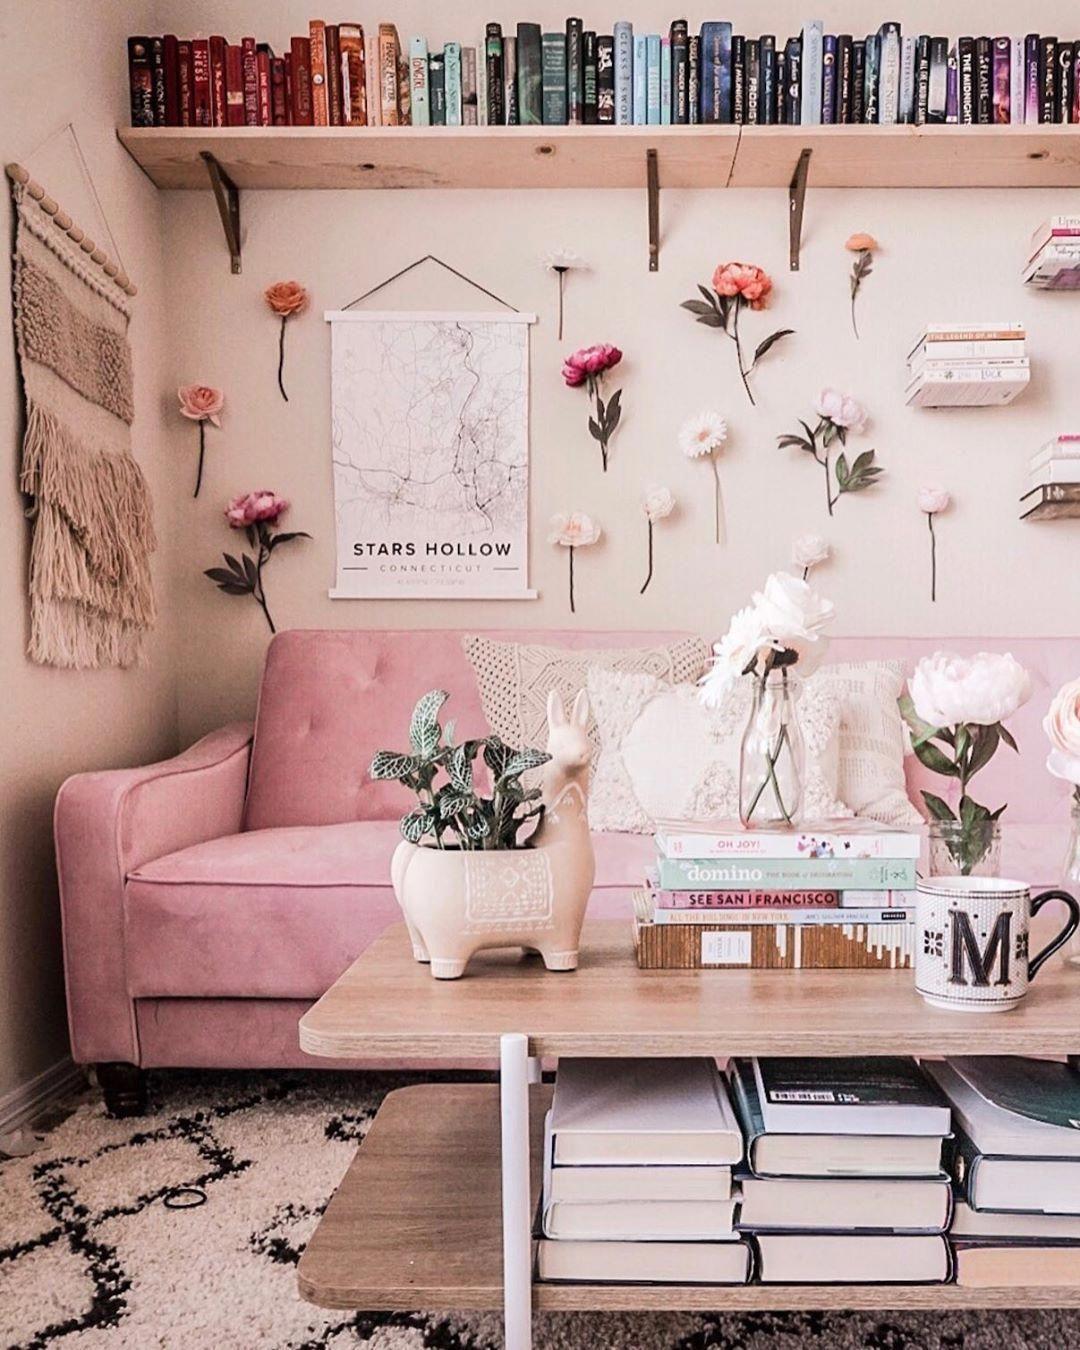 Chic Living Roomideas:  Living Room Inspo @astoldbymichelle #flowerwall